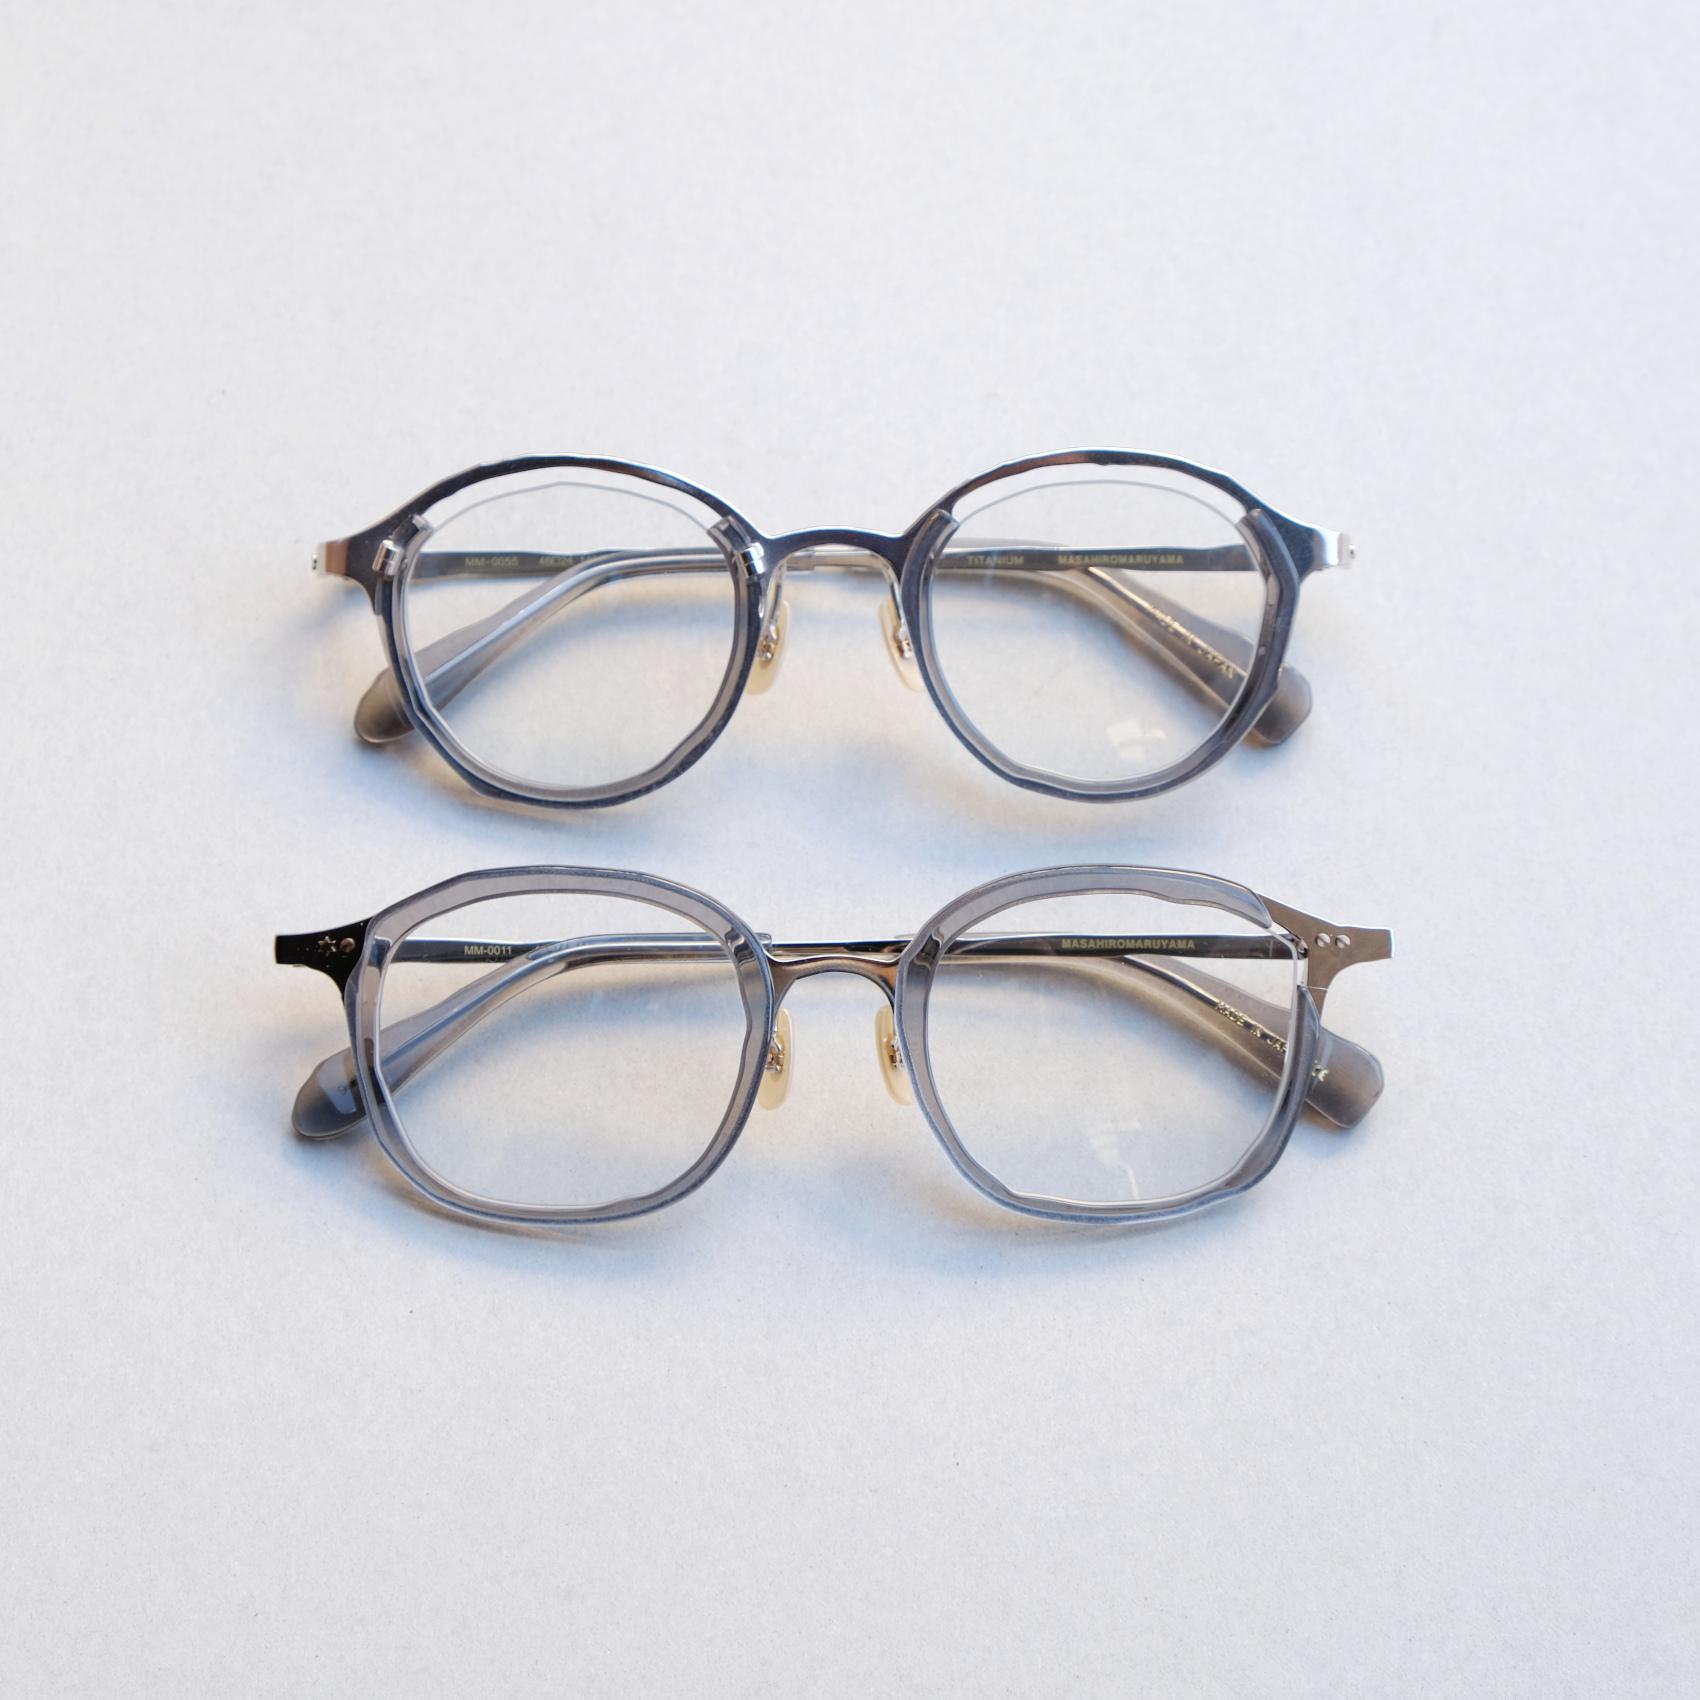 MASAHIRO‐MARUYAMA‐MM-0055-MM-0011-GREY/SILVER